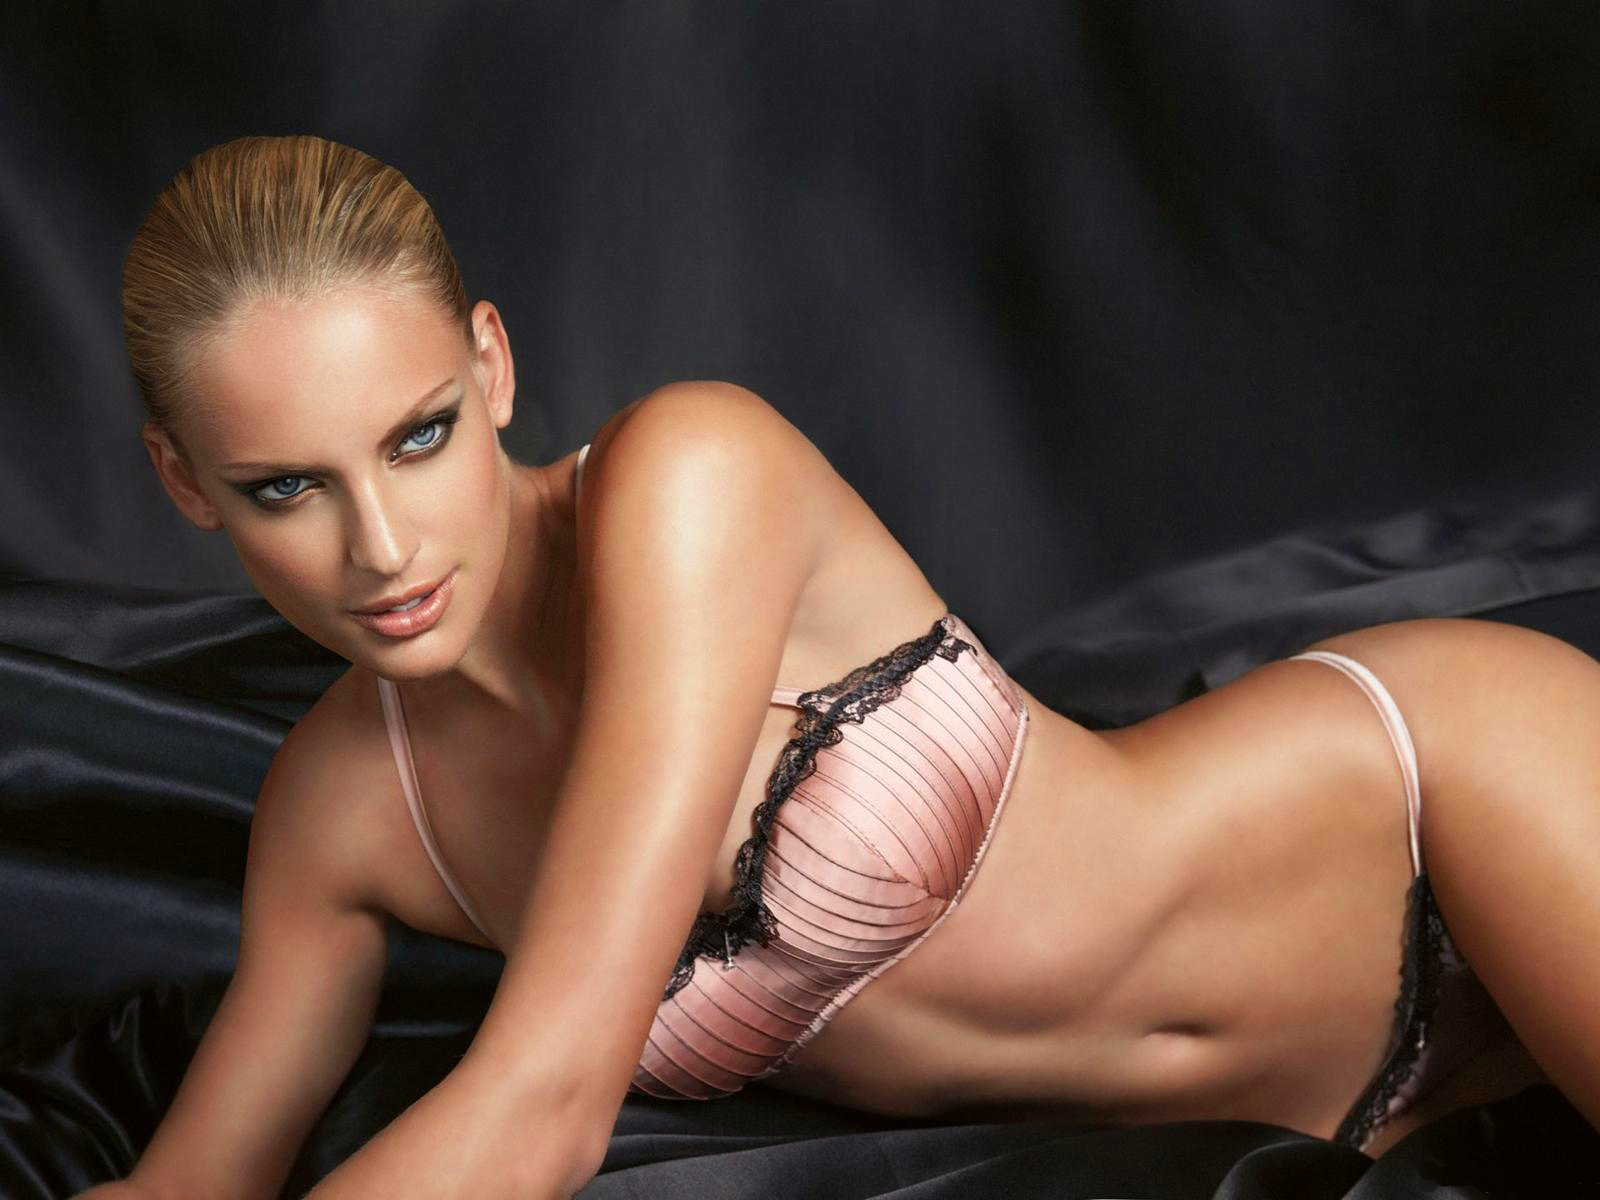 Nude beach lesbian